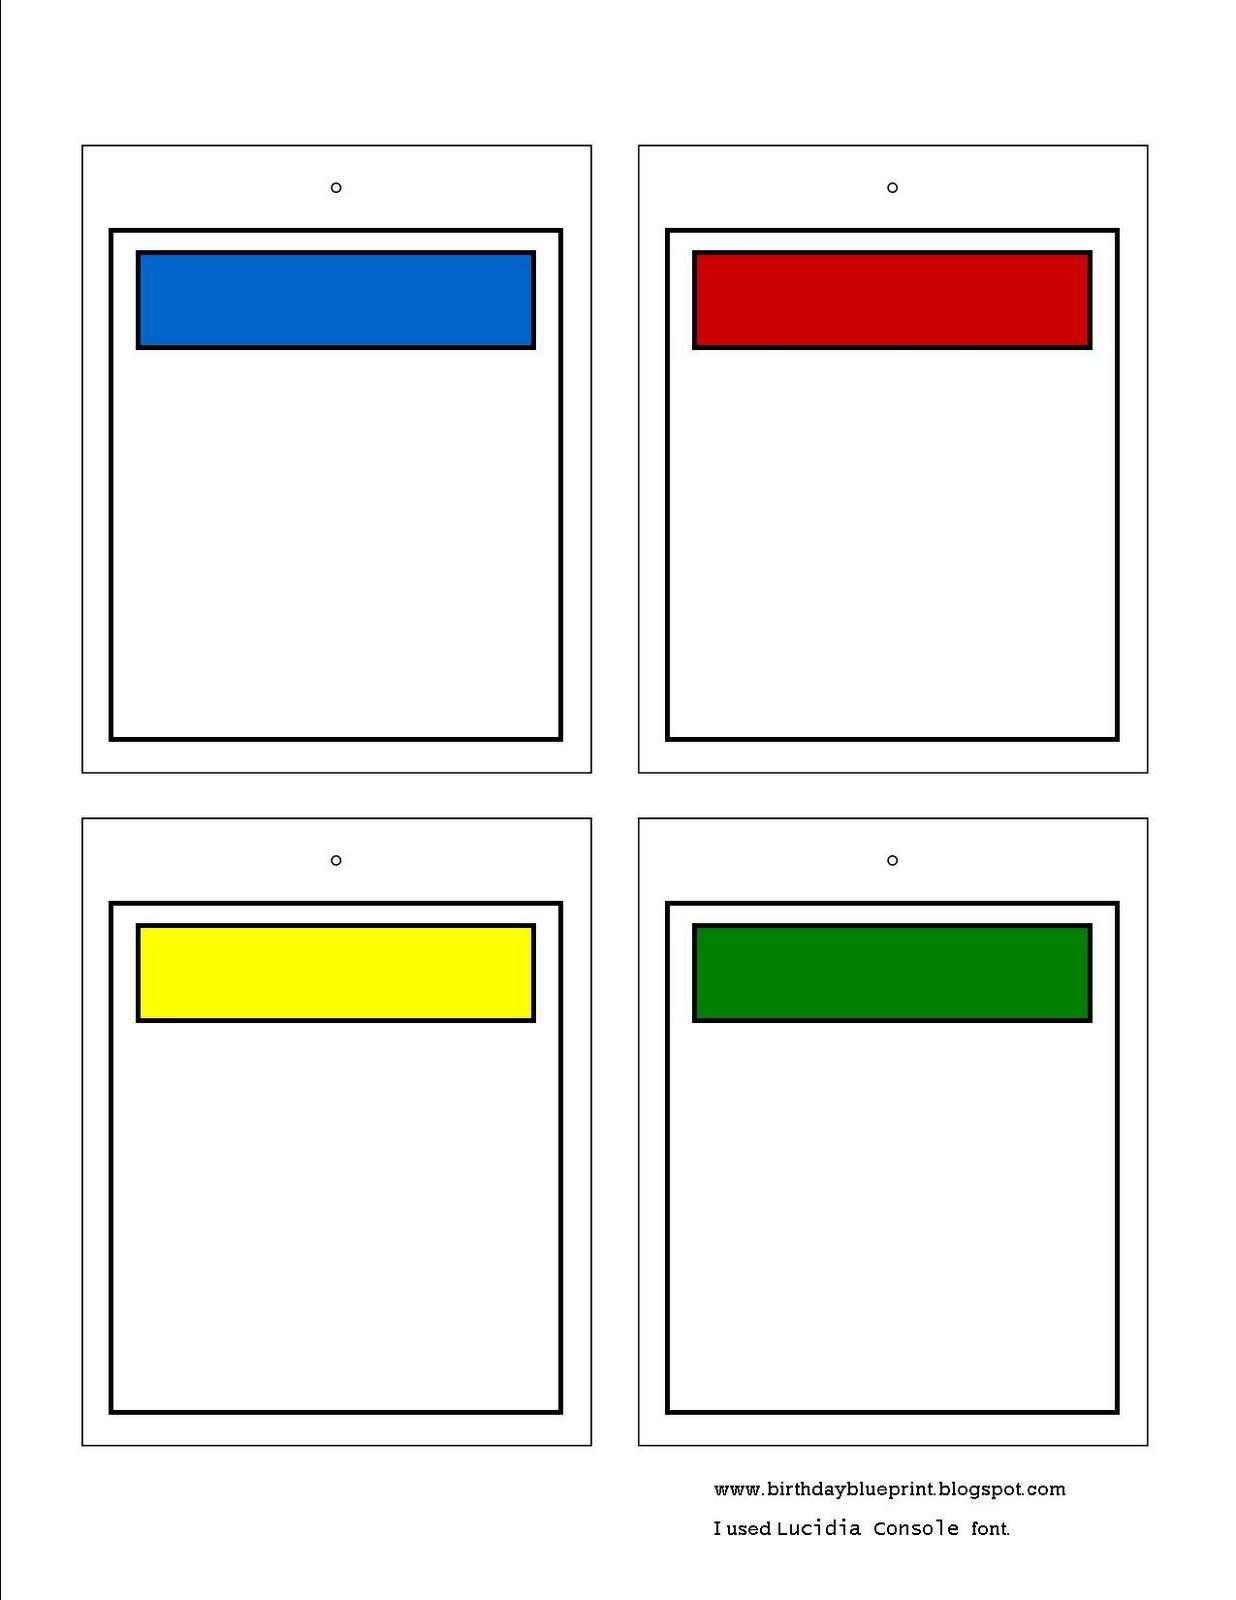 Alfa img - Showing > Printable Blank Monopoly Board